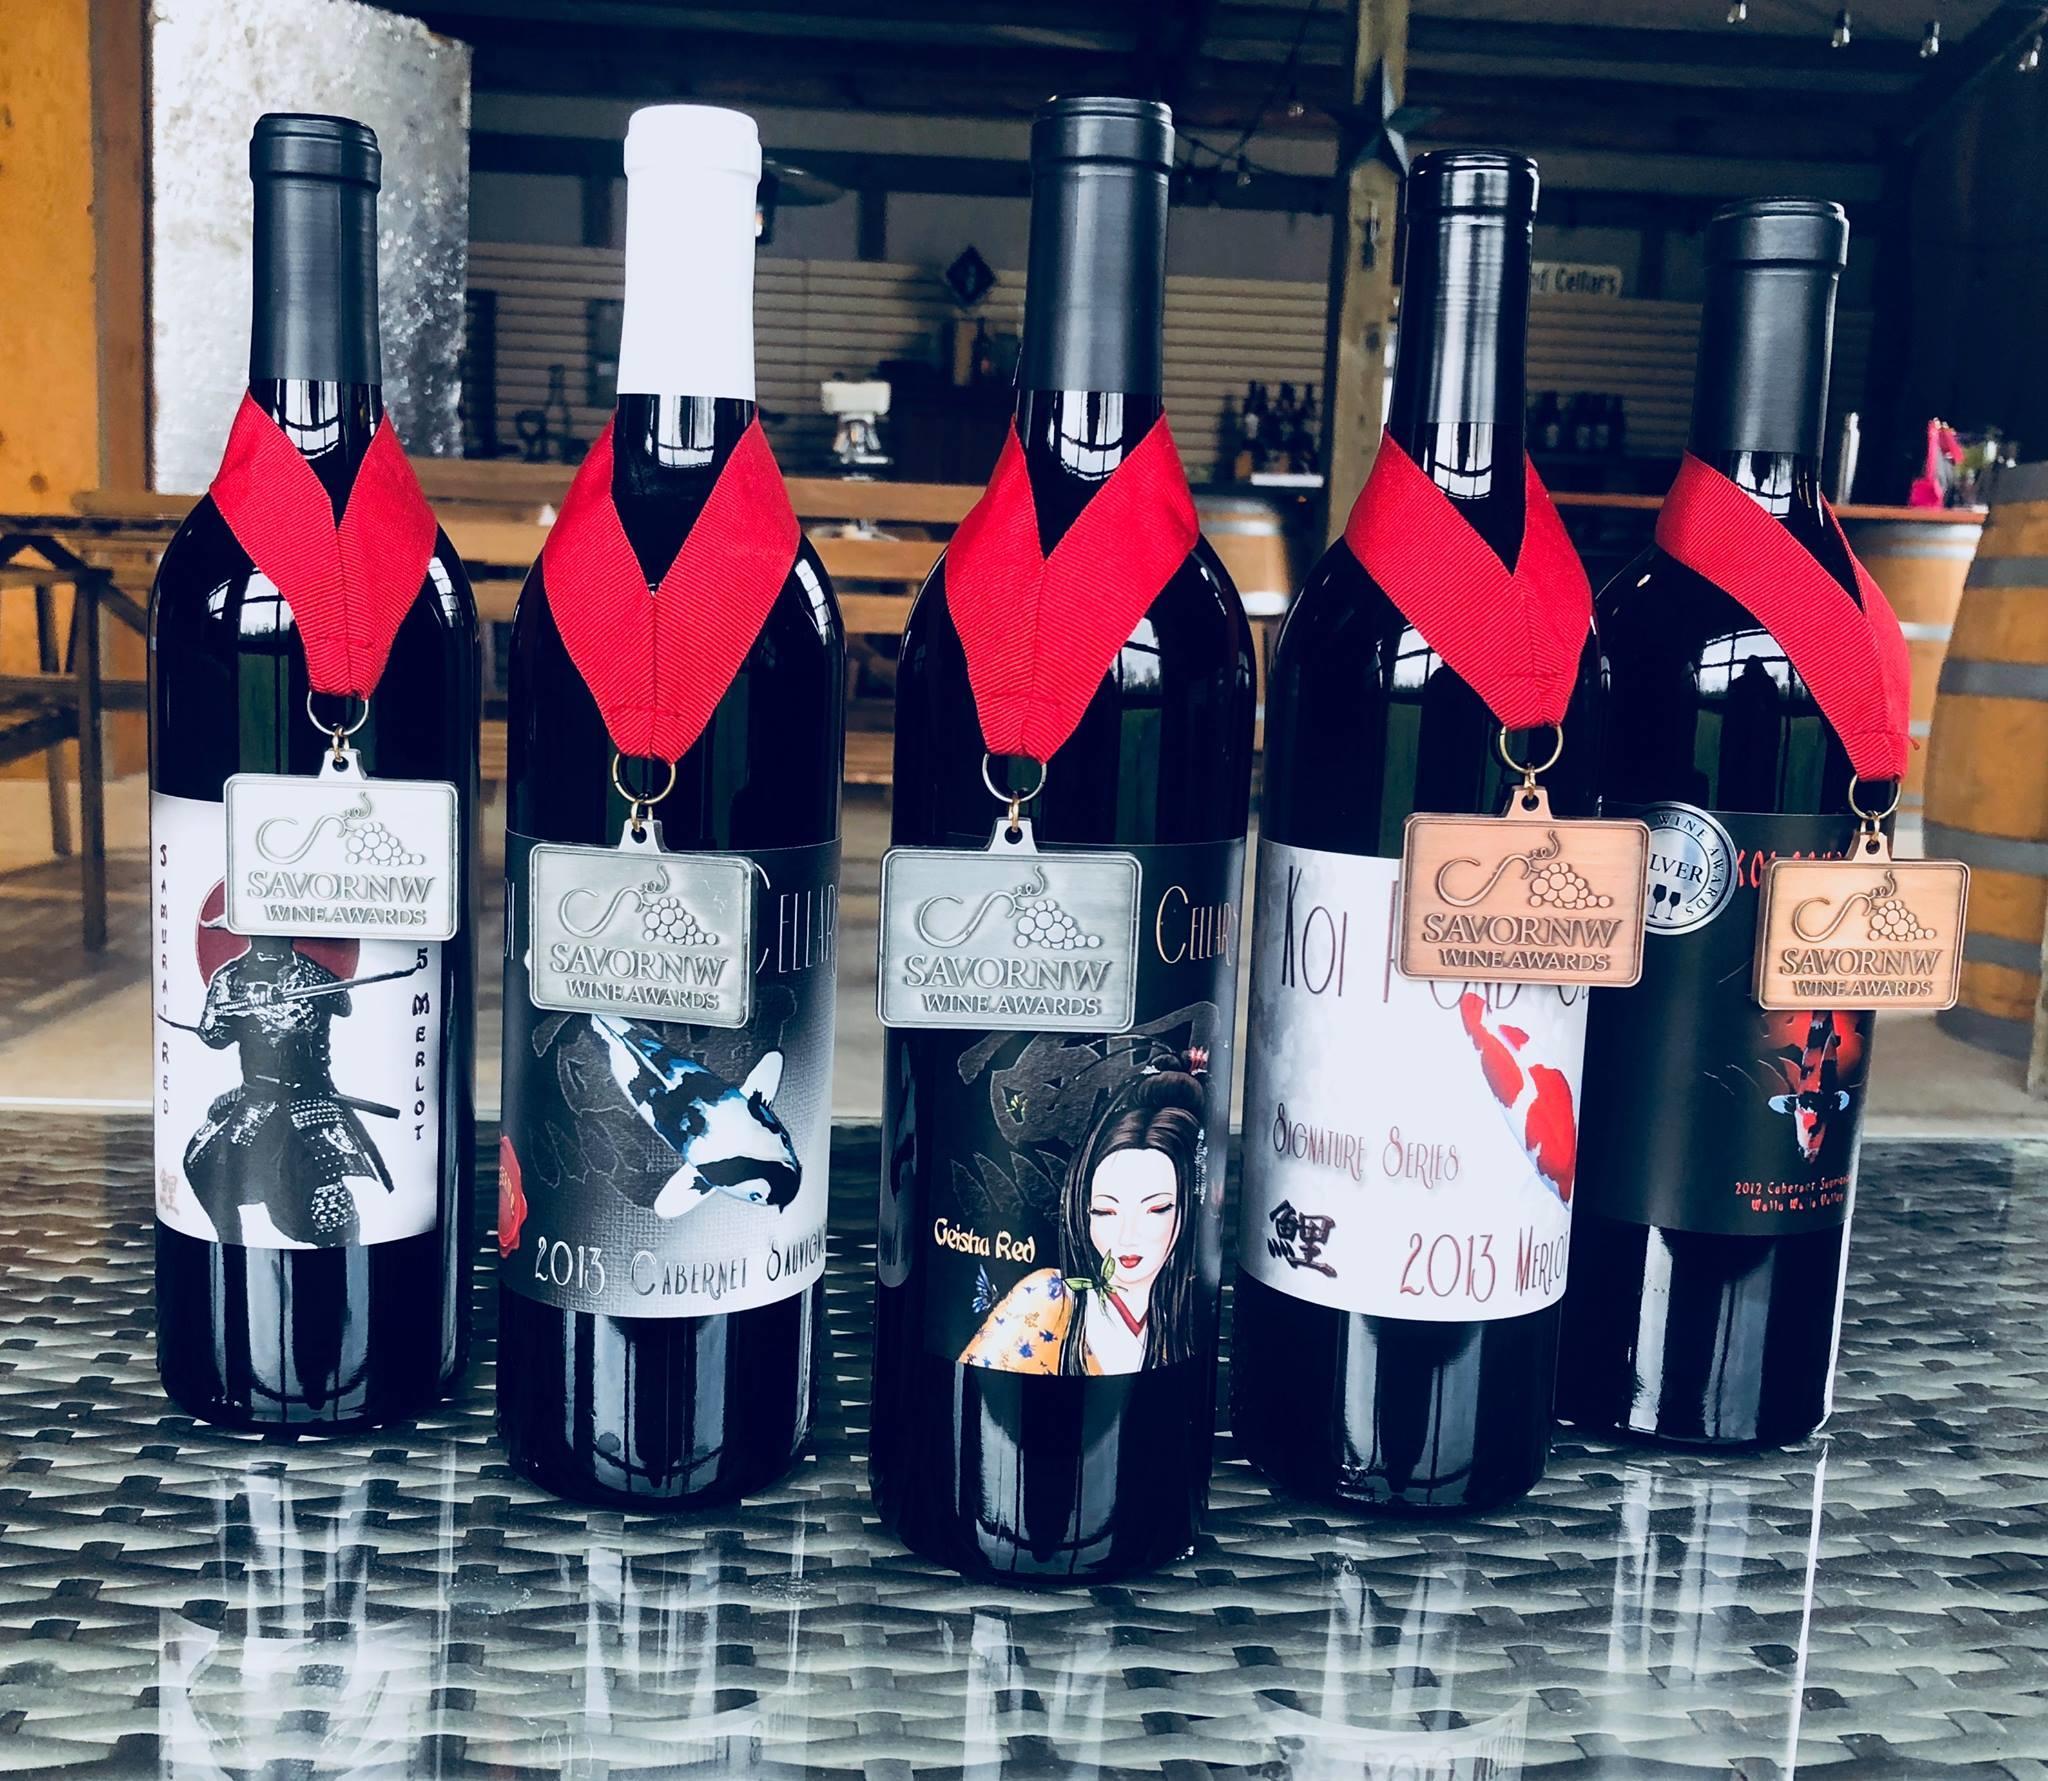 Koi Pond Cellars Winery & Bistro image 4